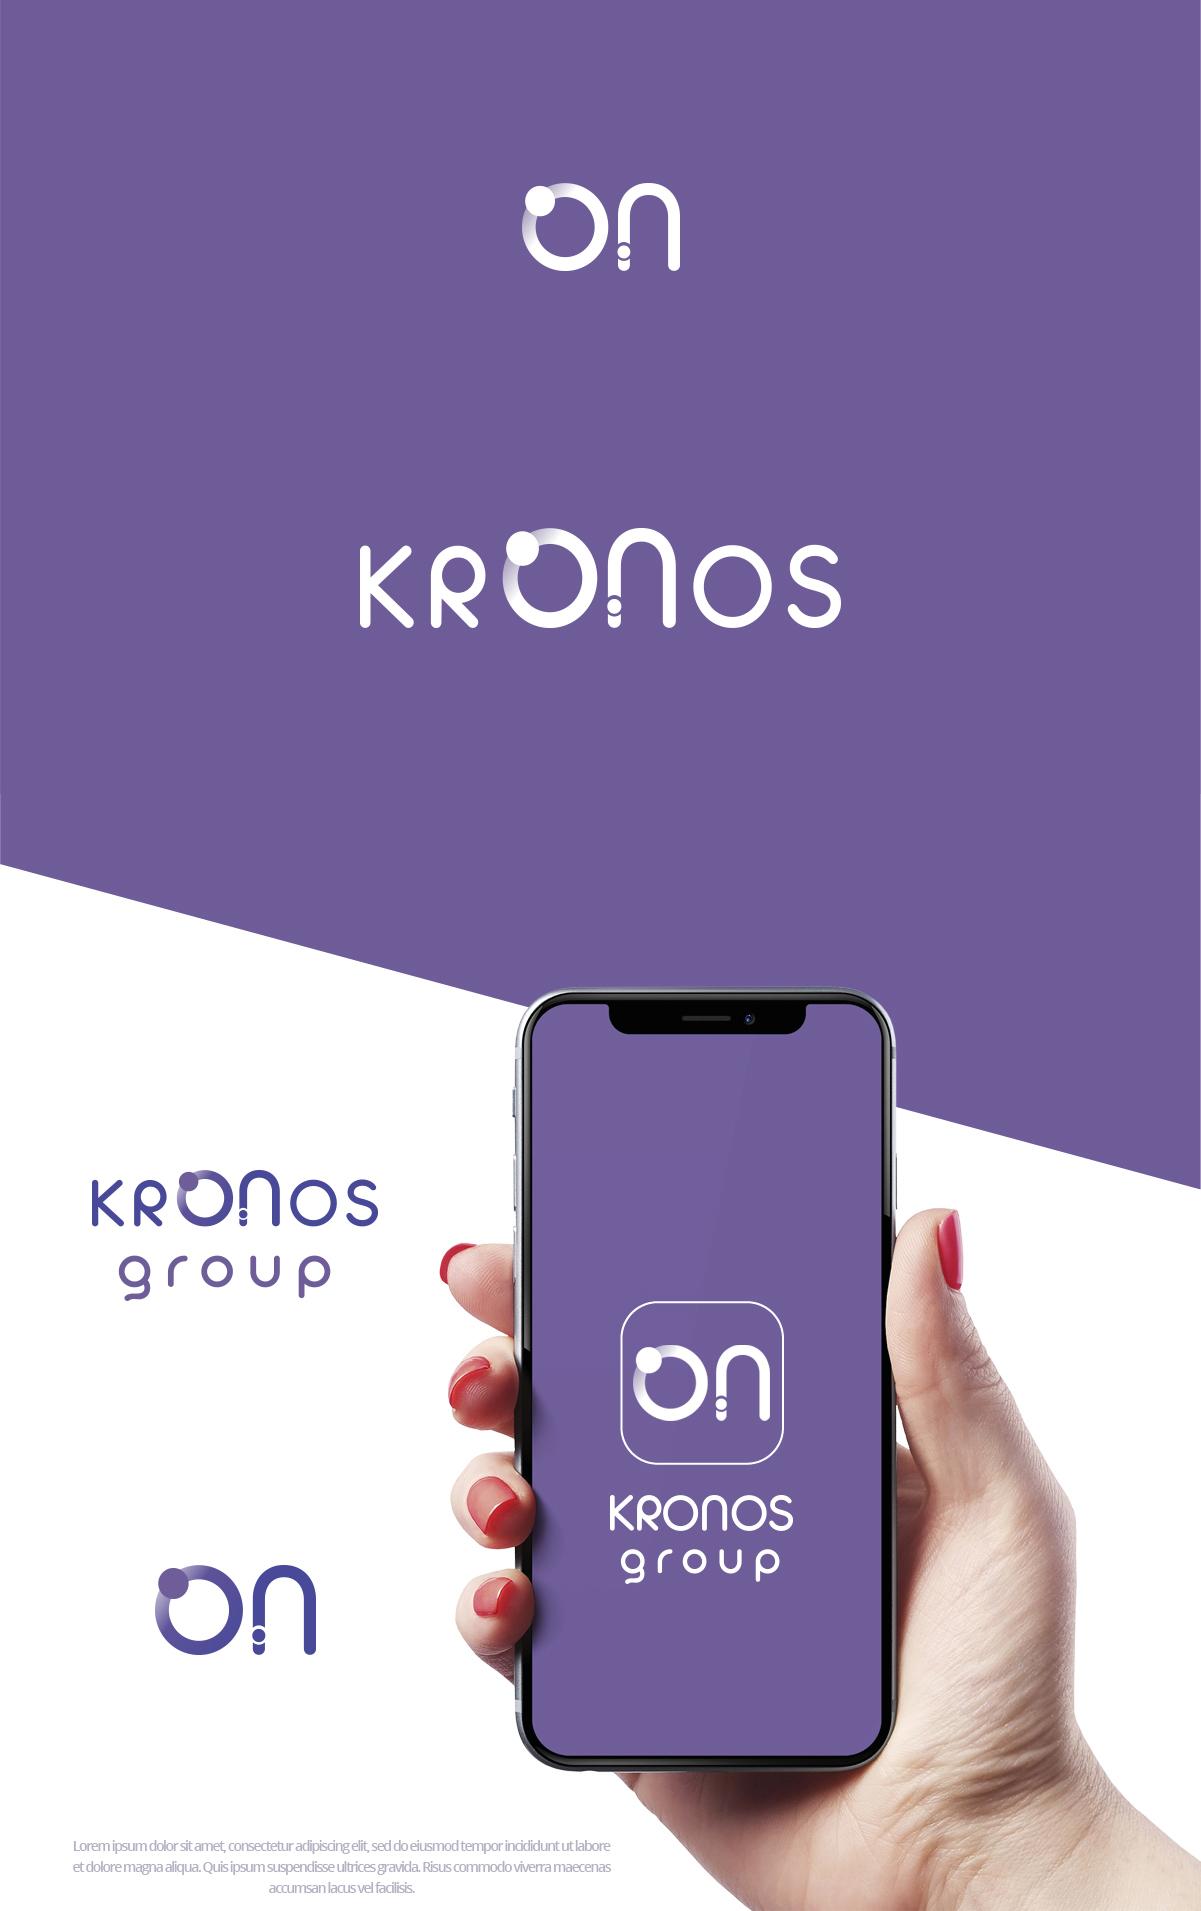 Разработать логотип KRONOS фото f_0765fb23c2bcfd5d.jpg